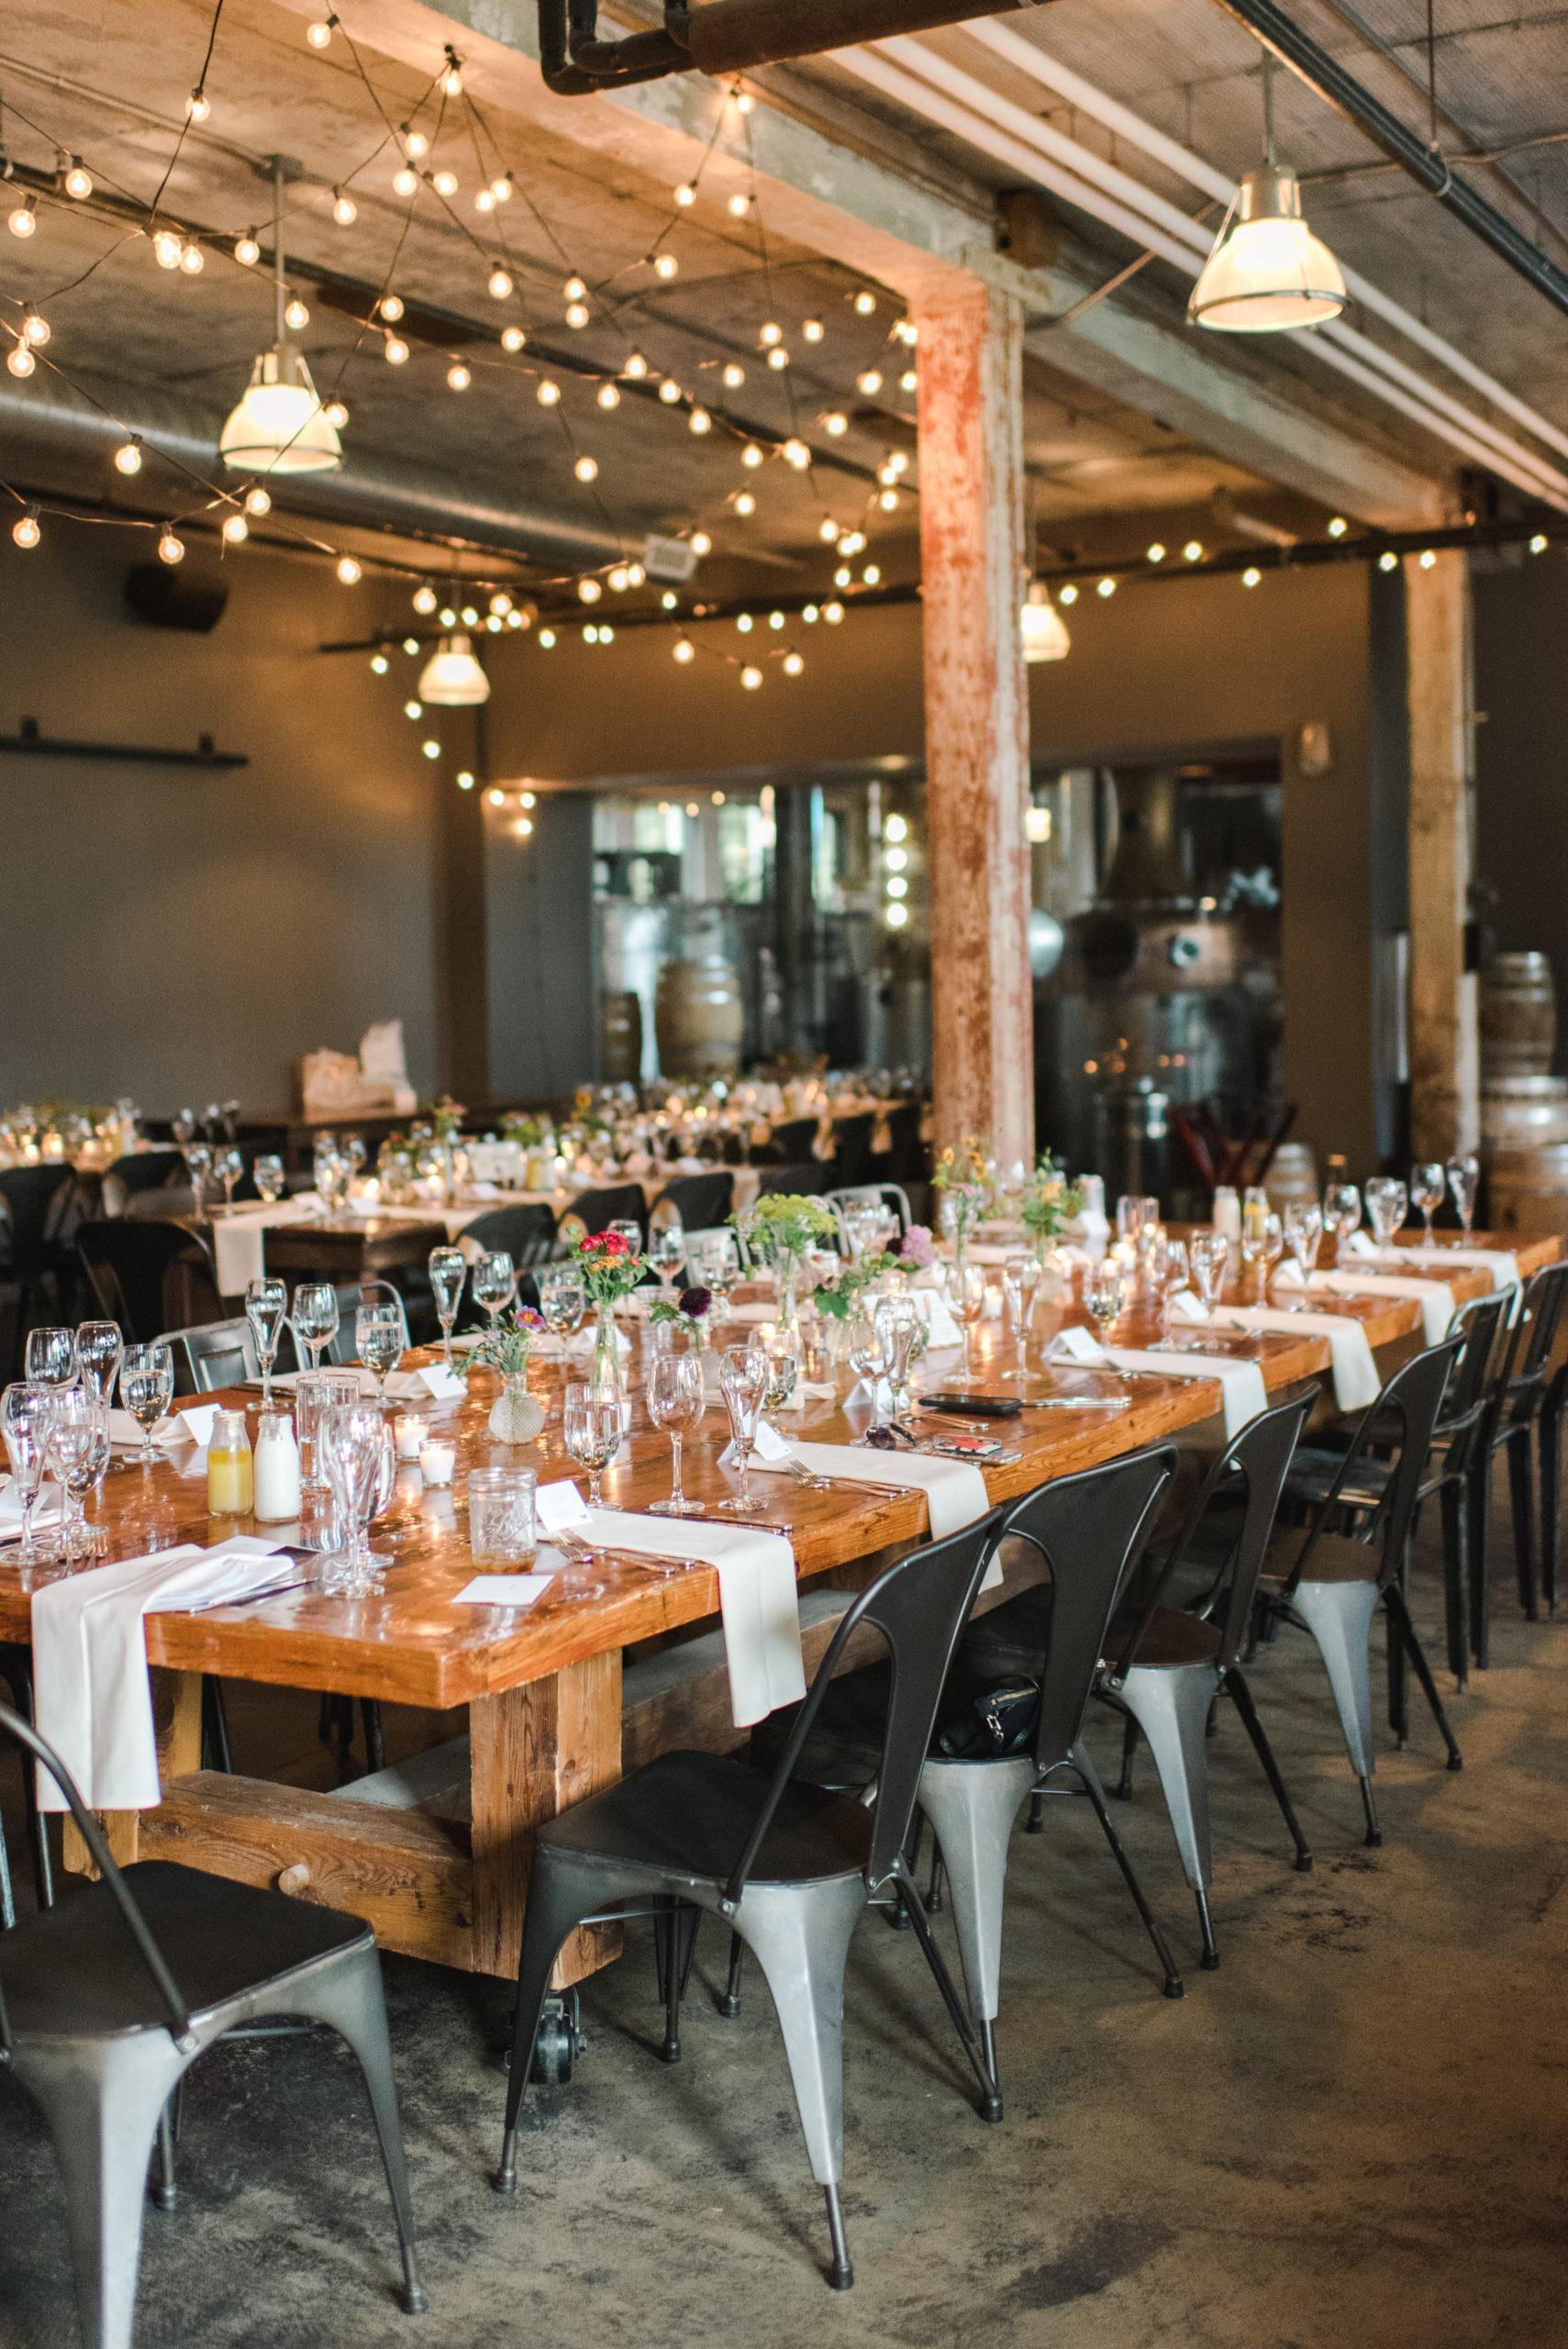 Tables set for a Journeyman Distillery wedding